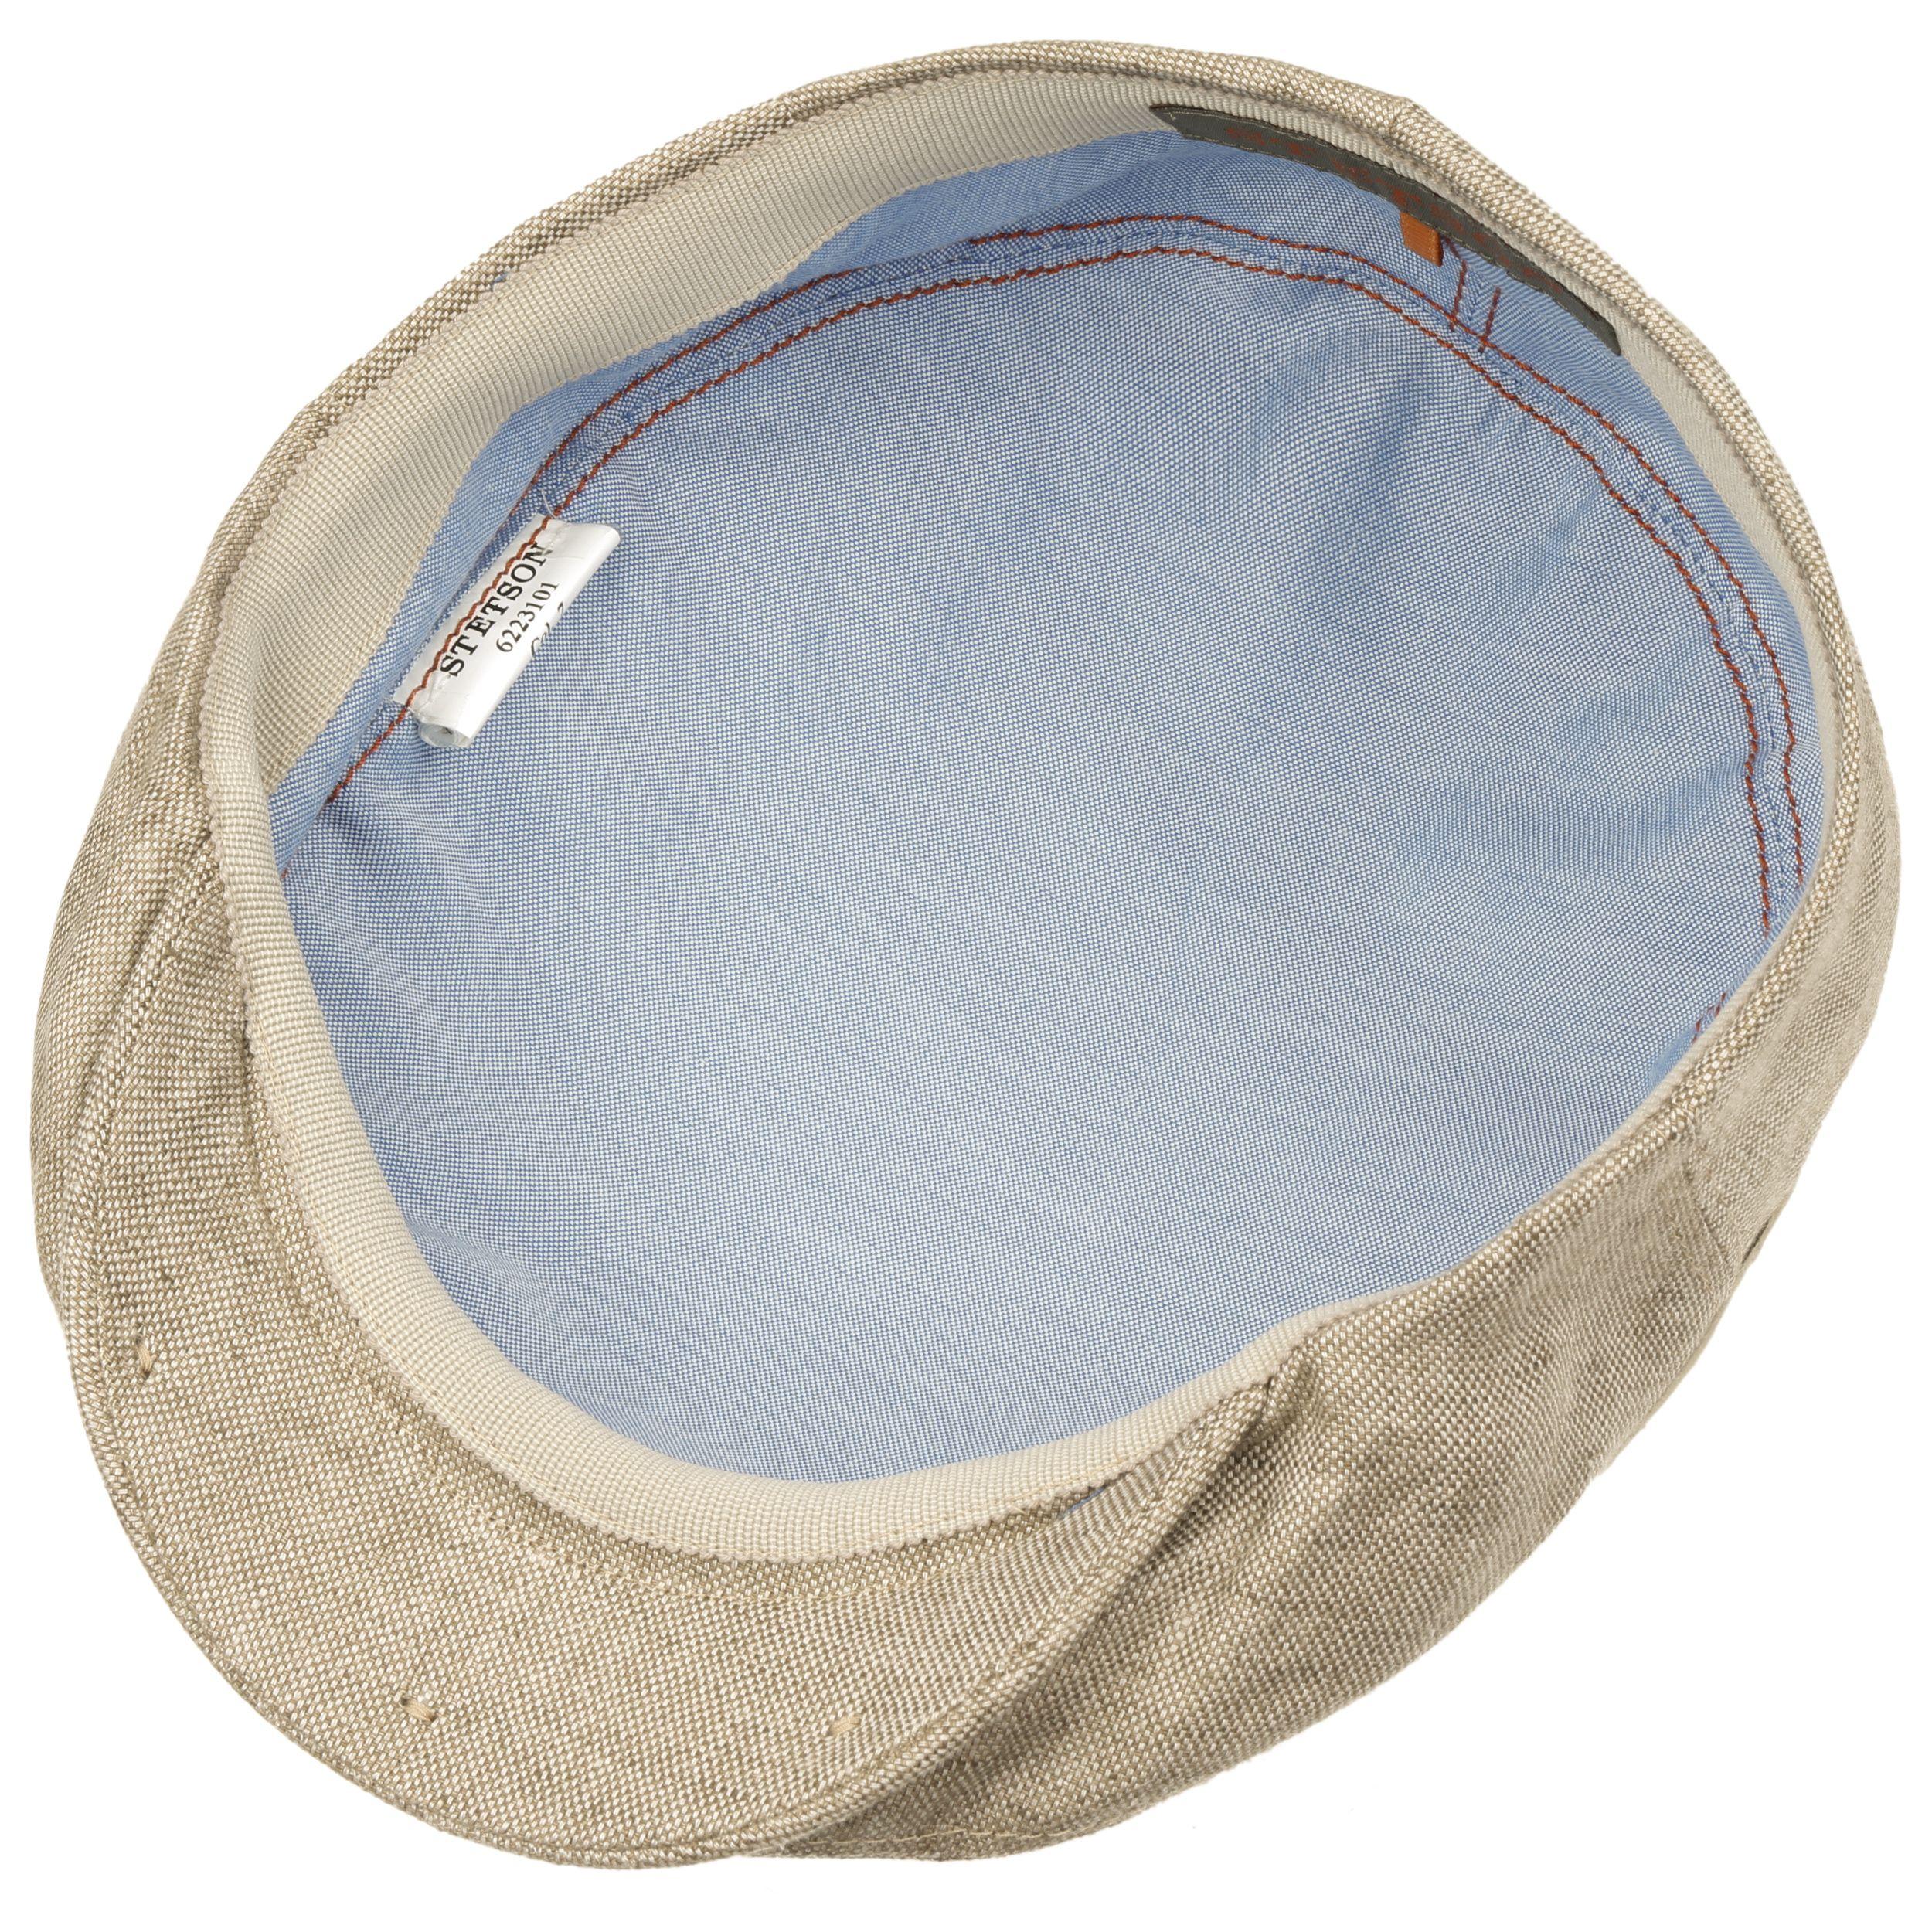 Just Linen Flat Cap brown